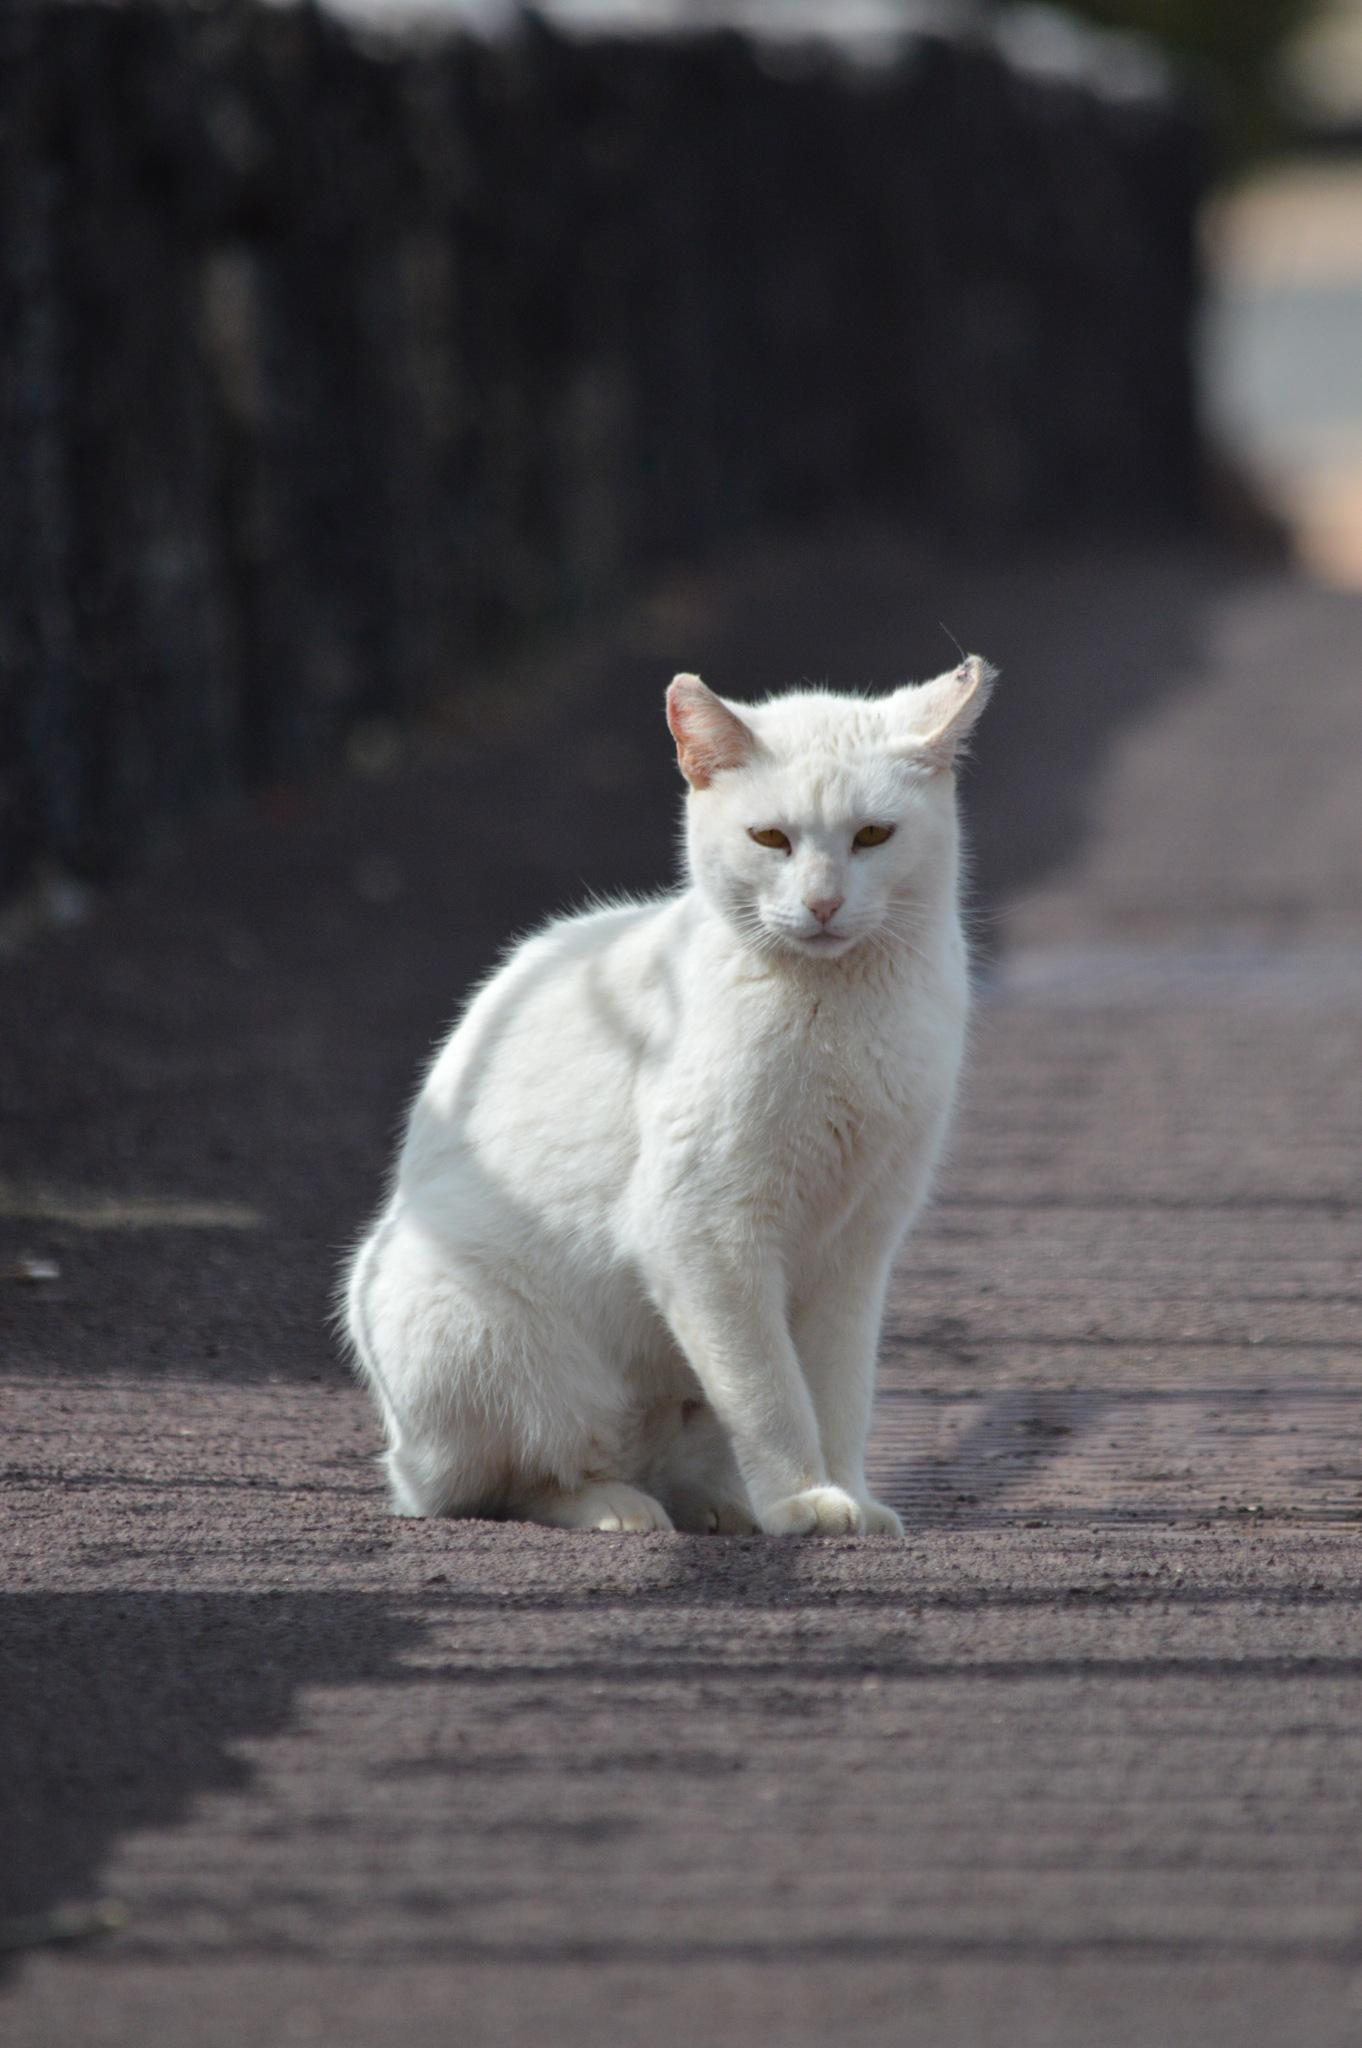 prrrrretty kitty by HollyH